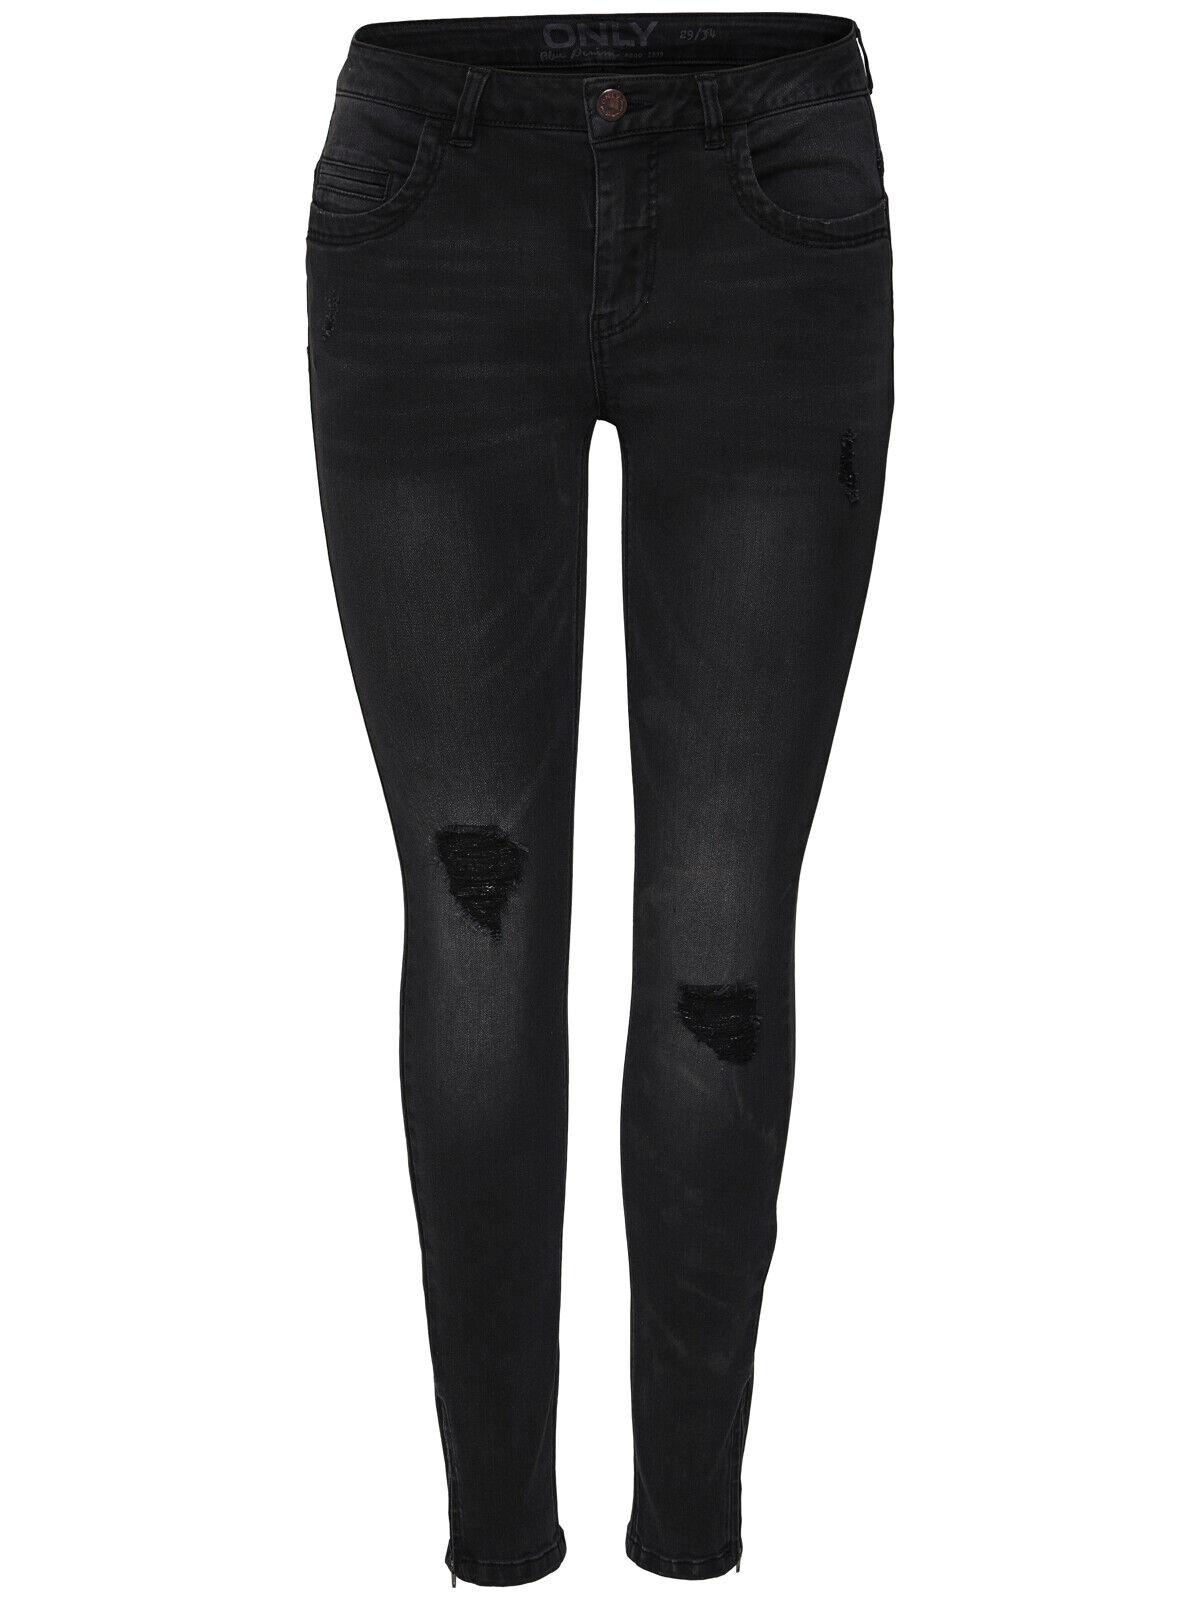 Only Damen Hose OnlKendell Reg DNM Jeans BJ9508 15138624 enge schwarze Hose NEU